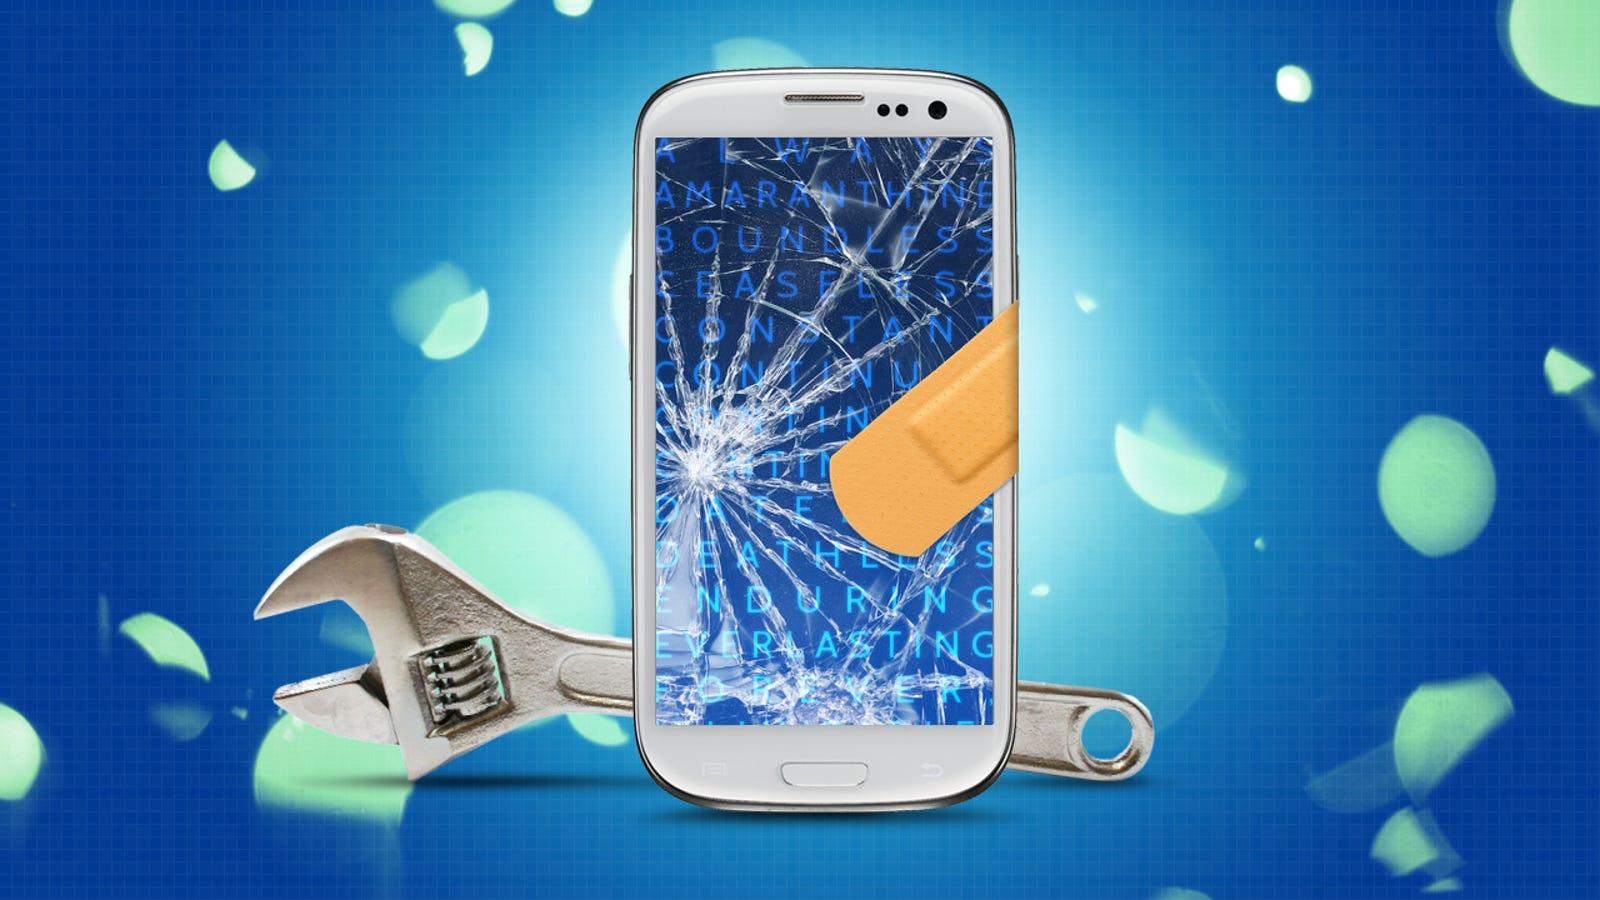 Top 10 Diy Repairs And Upgrades To Make Your Smartphone Last Forever Mobile Short Circuit Repair Tip